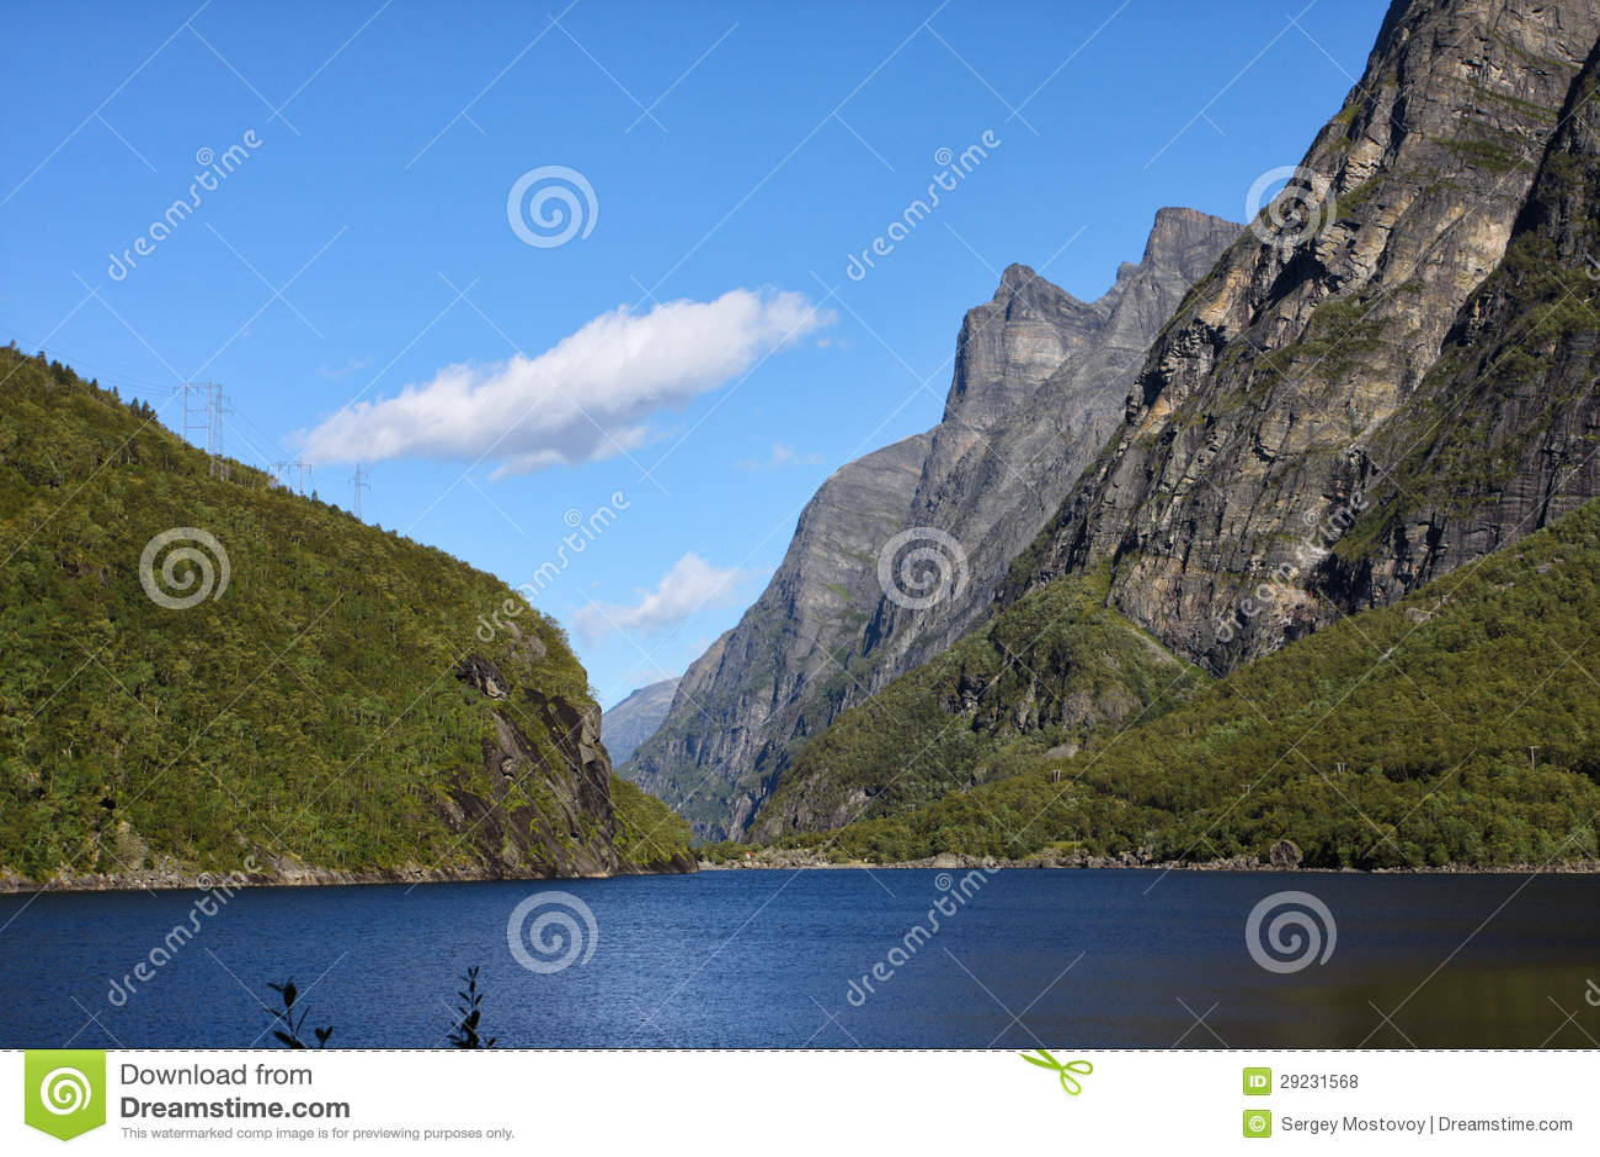 Download Lago mountain foto de stock. Imagem de vista, verde, costa - 29231568